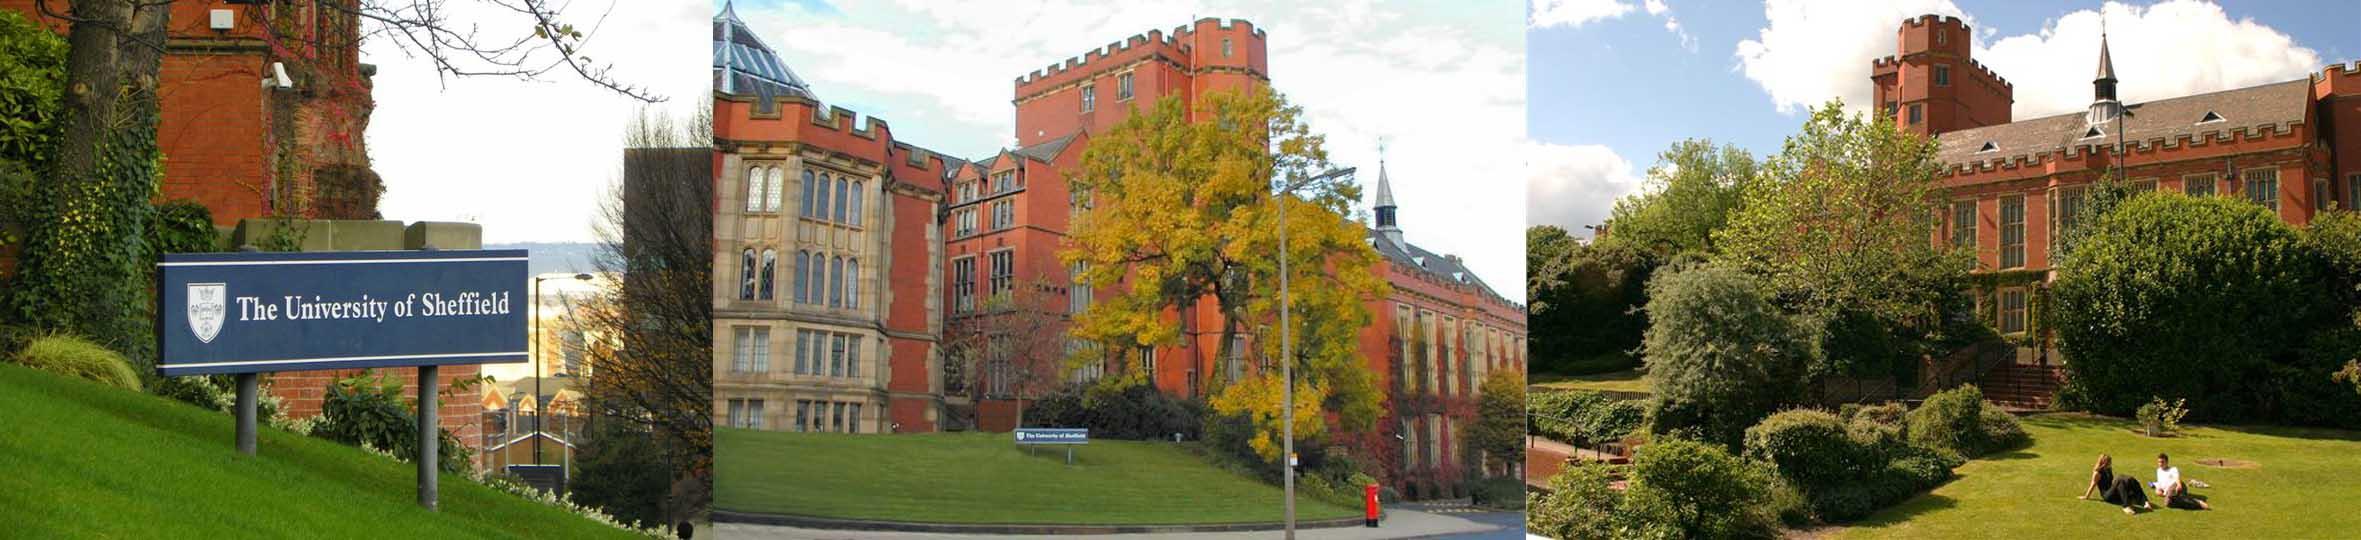 Shellield University